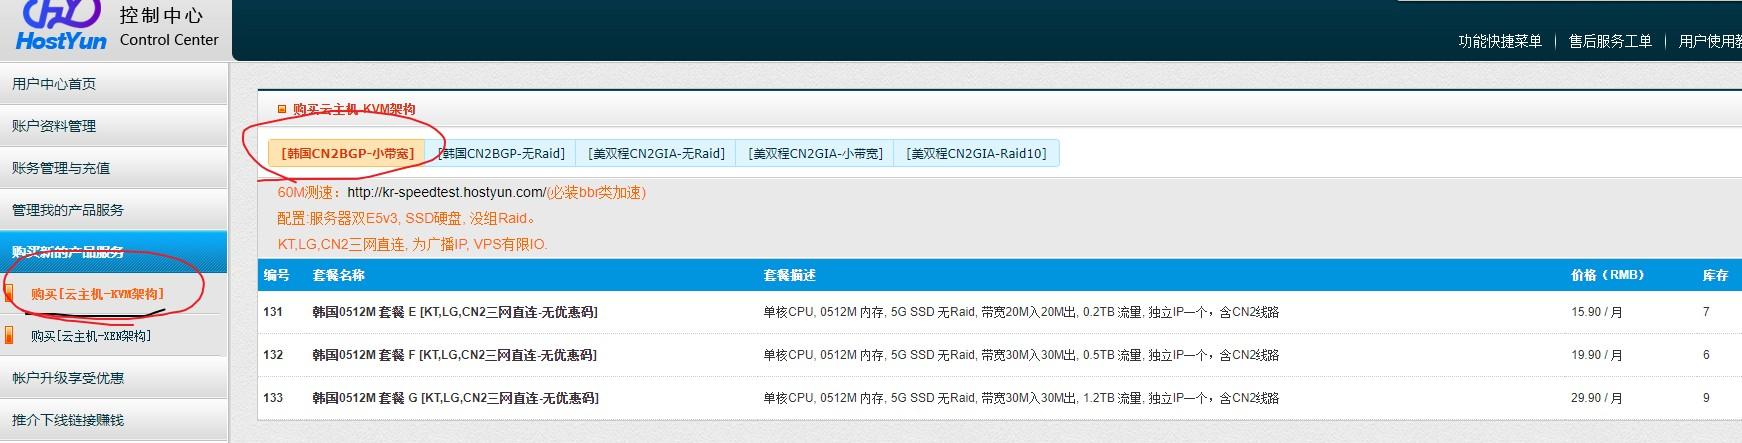 HostYun:15.9元/月/512MB内存/5GB SSD空间/vps/韩国CN2+KT+LG